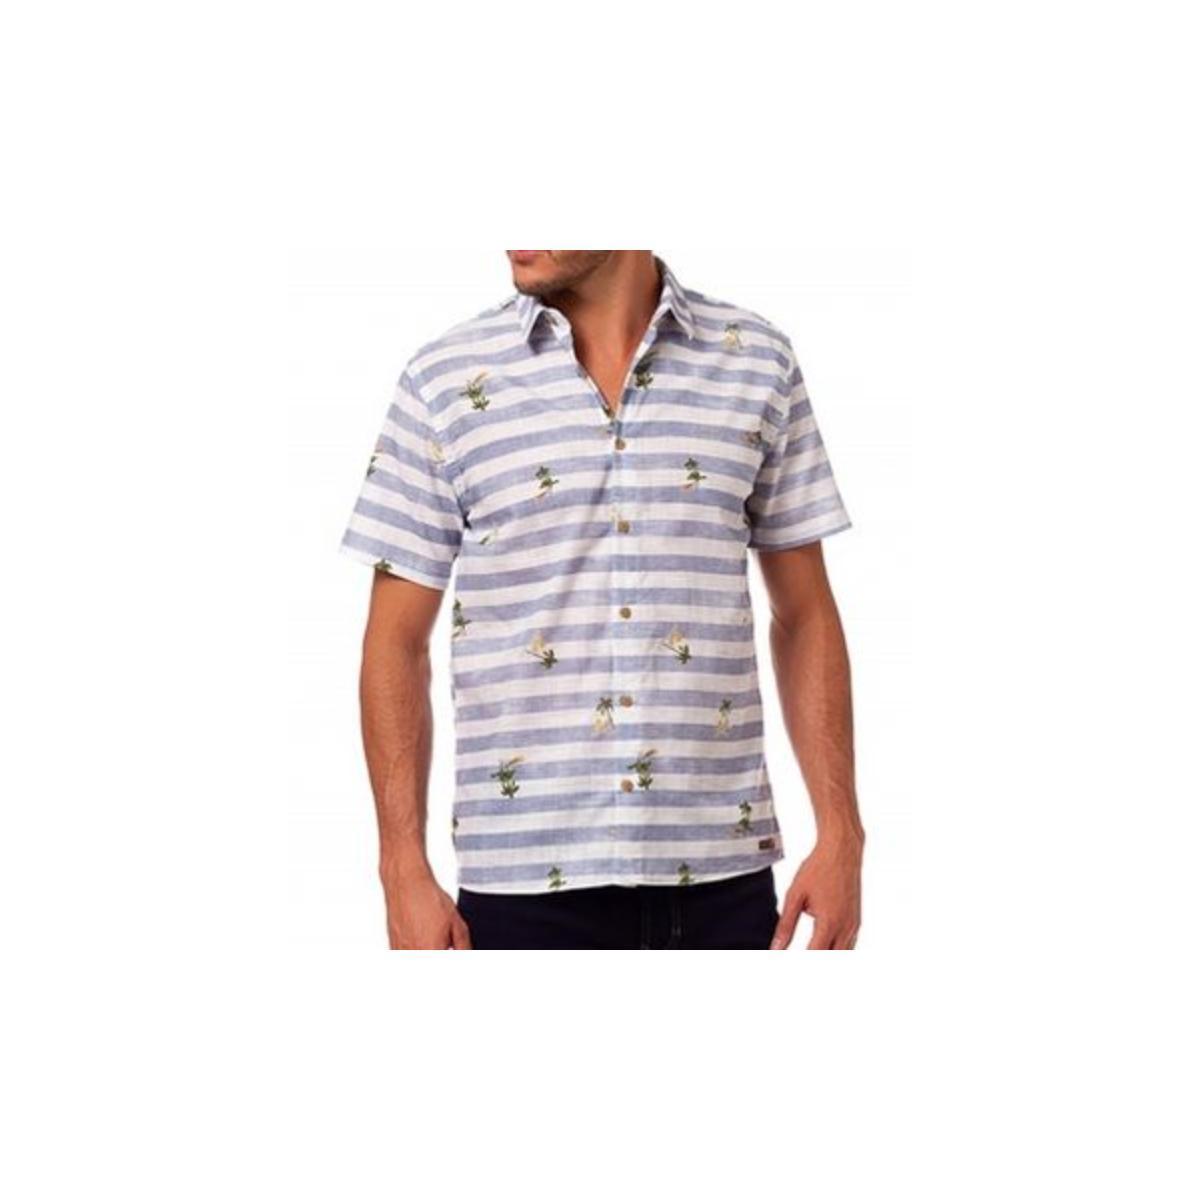 Camisa Masculina Colcci 310103633 Vc34 Listrado